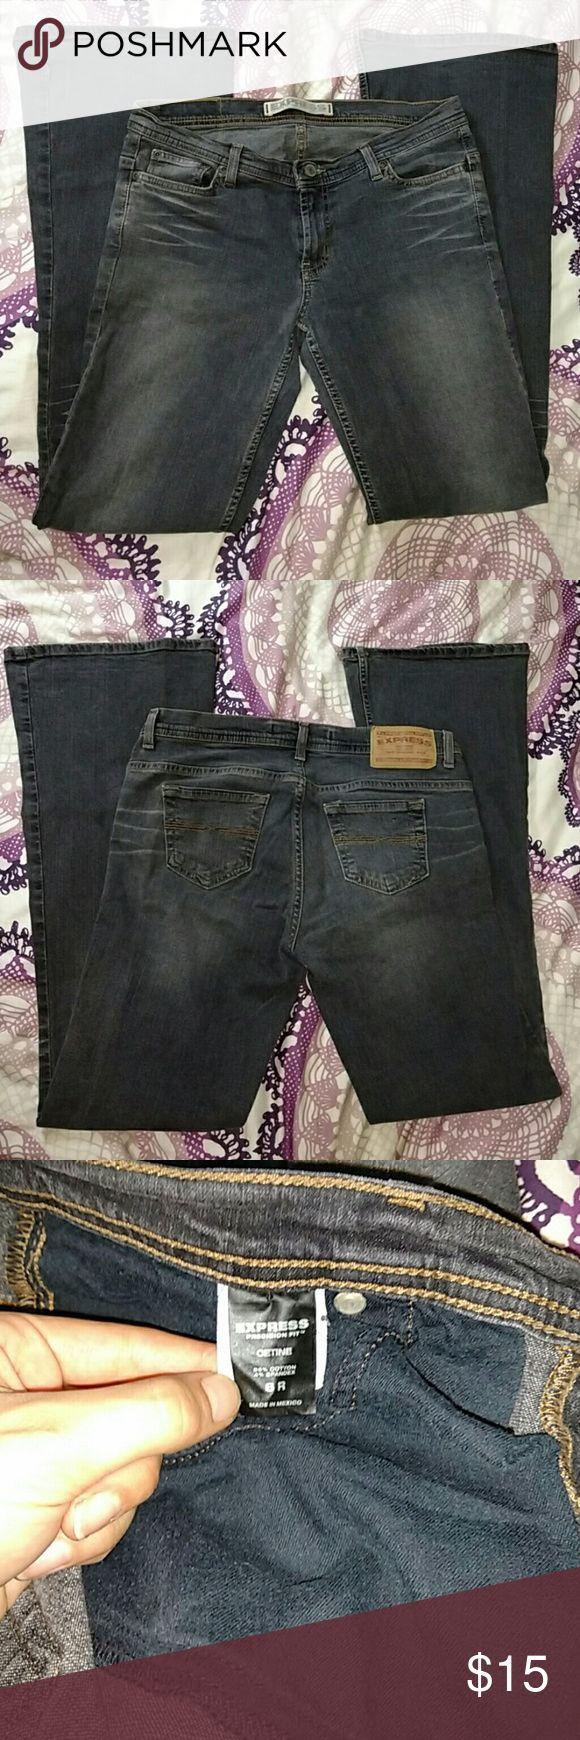 EUC Express Cetine Extreme Bikini Flare 8R Premium copper wash, like new condition! Size 8R Express Jeans Flare & Wide Leg